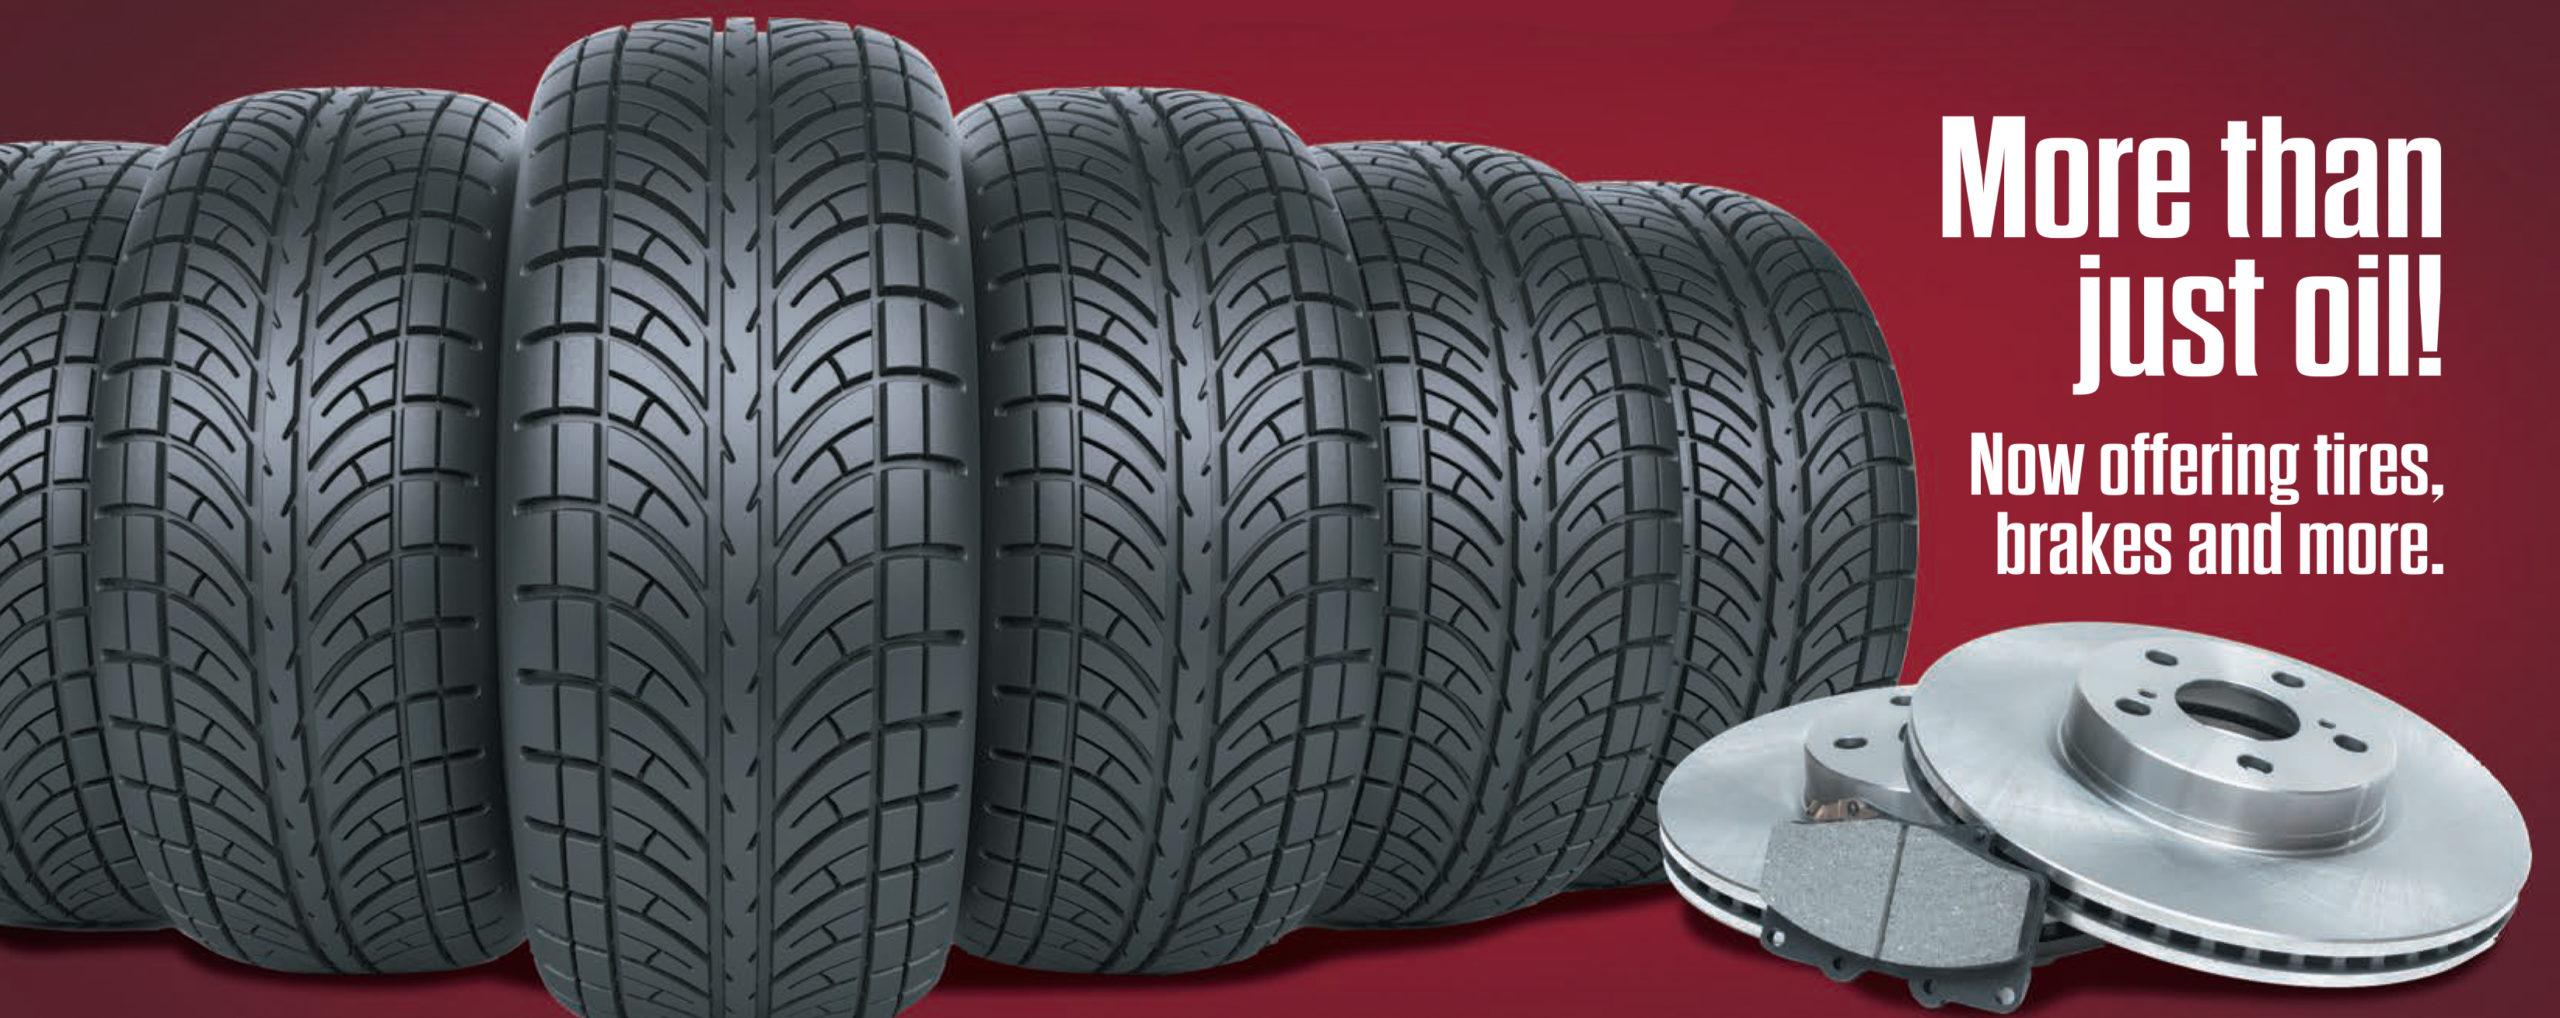 Jiffy Tires Brakes